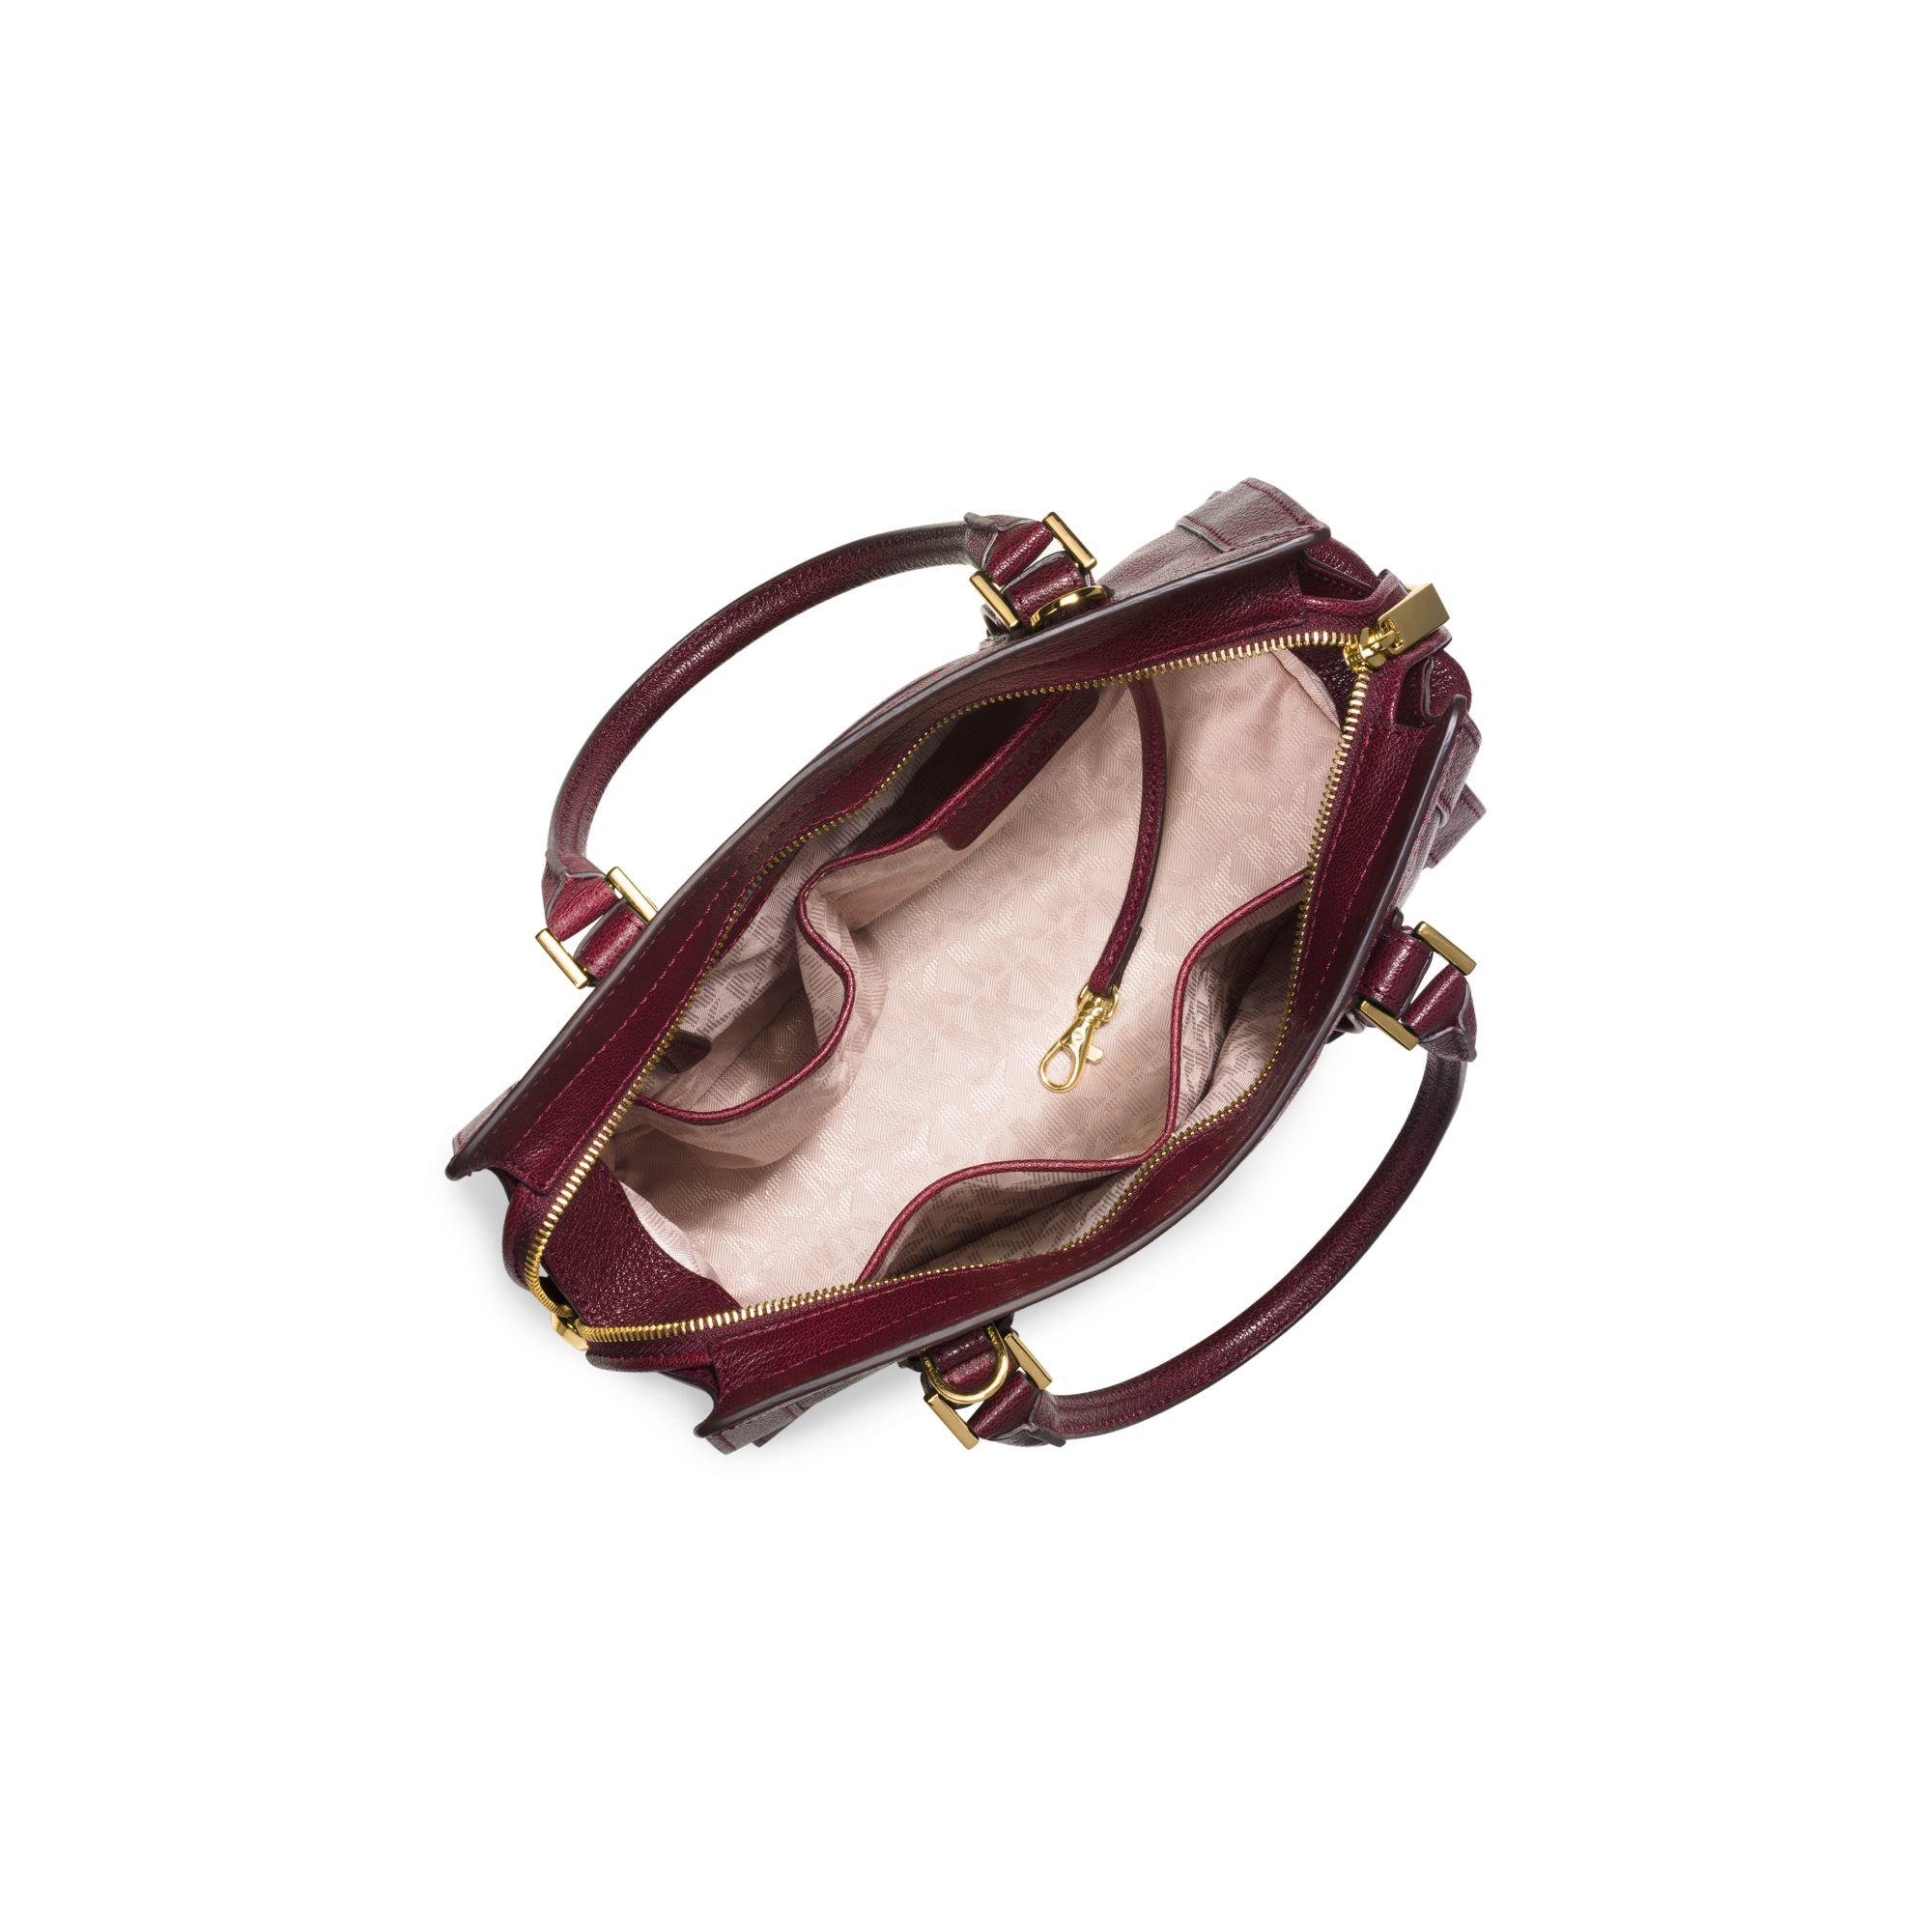 f94ff069f915 closeout michael kors hamilton medium satchel bag e4326 60972  discount  code for lyst michael kors collins stud medium leather satchel in red 6e823  e517e